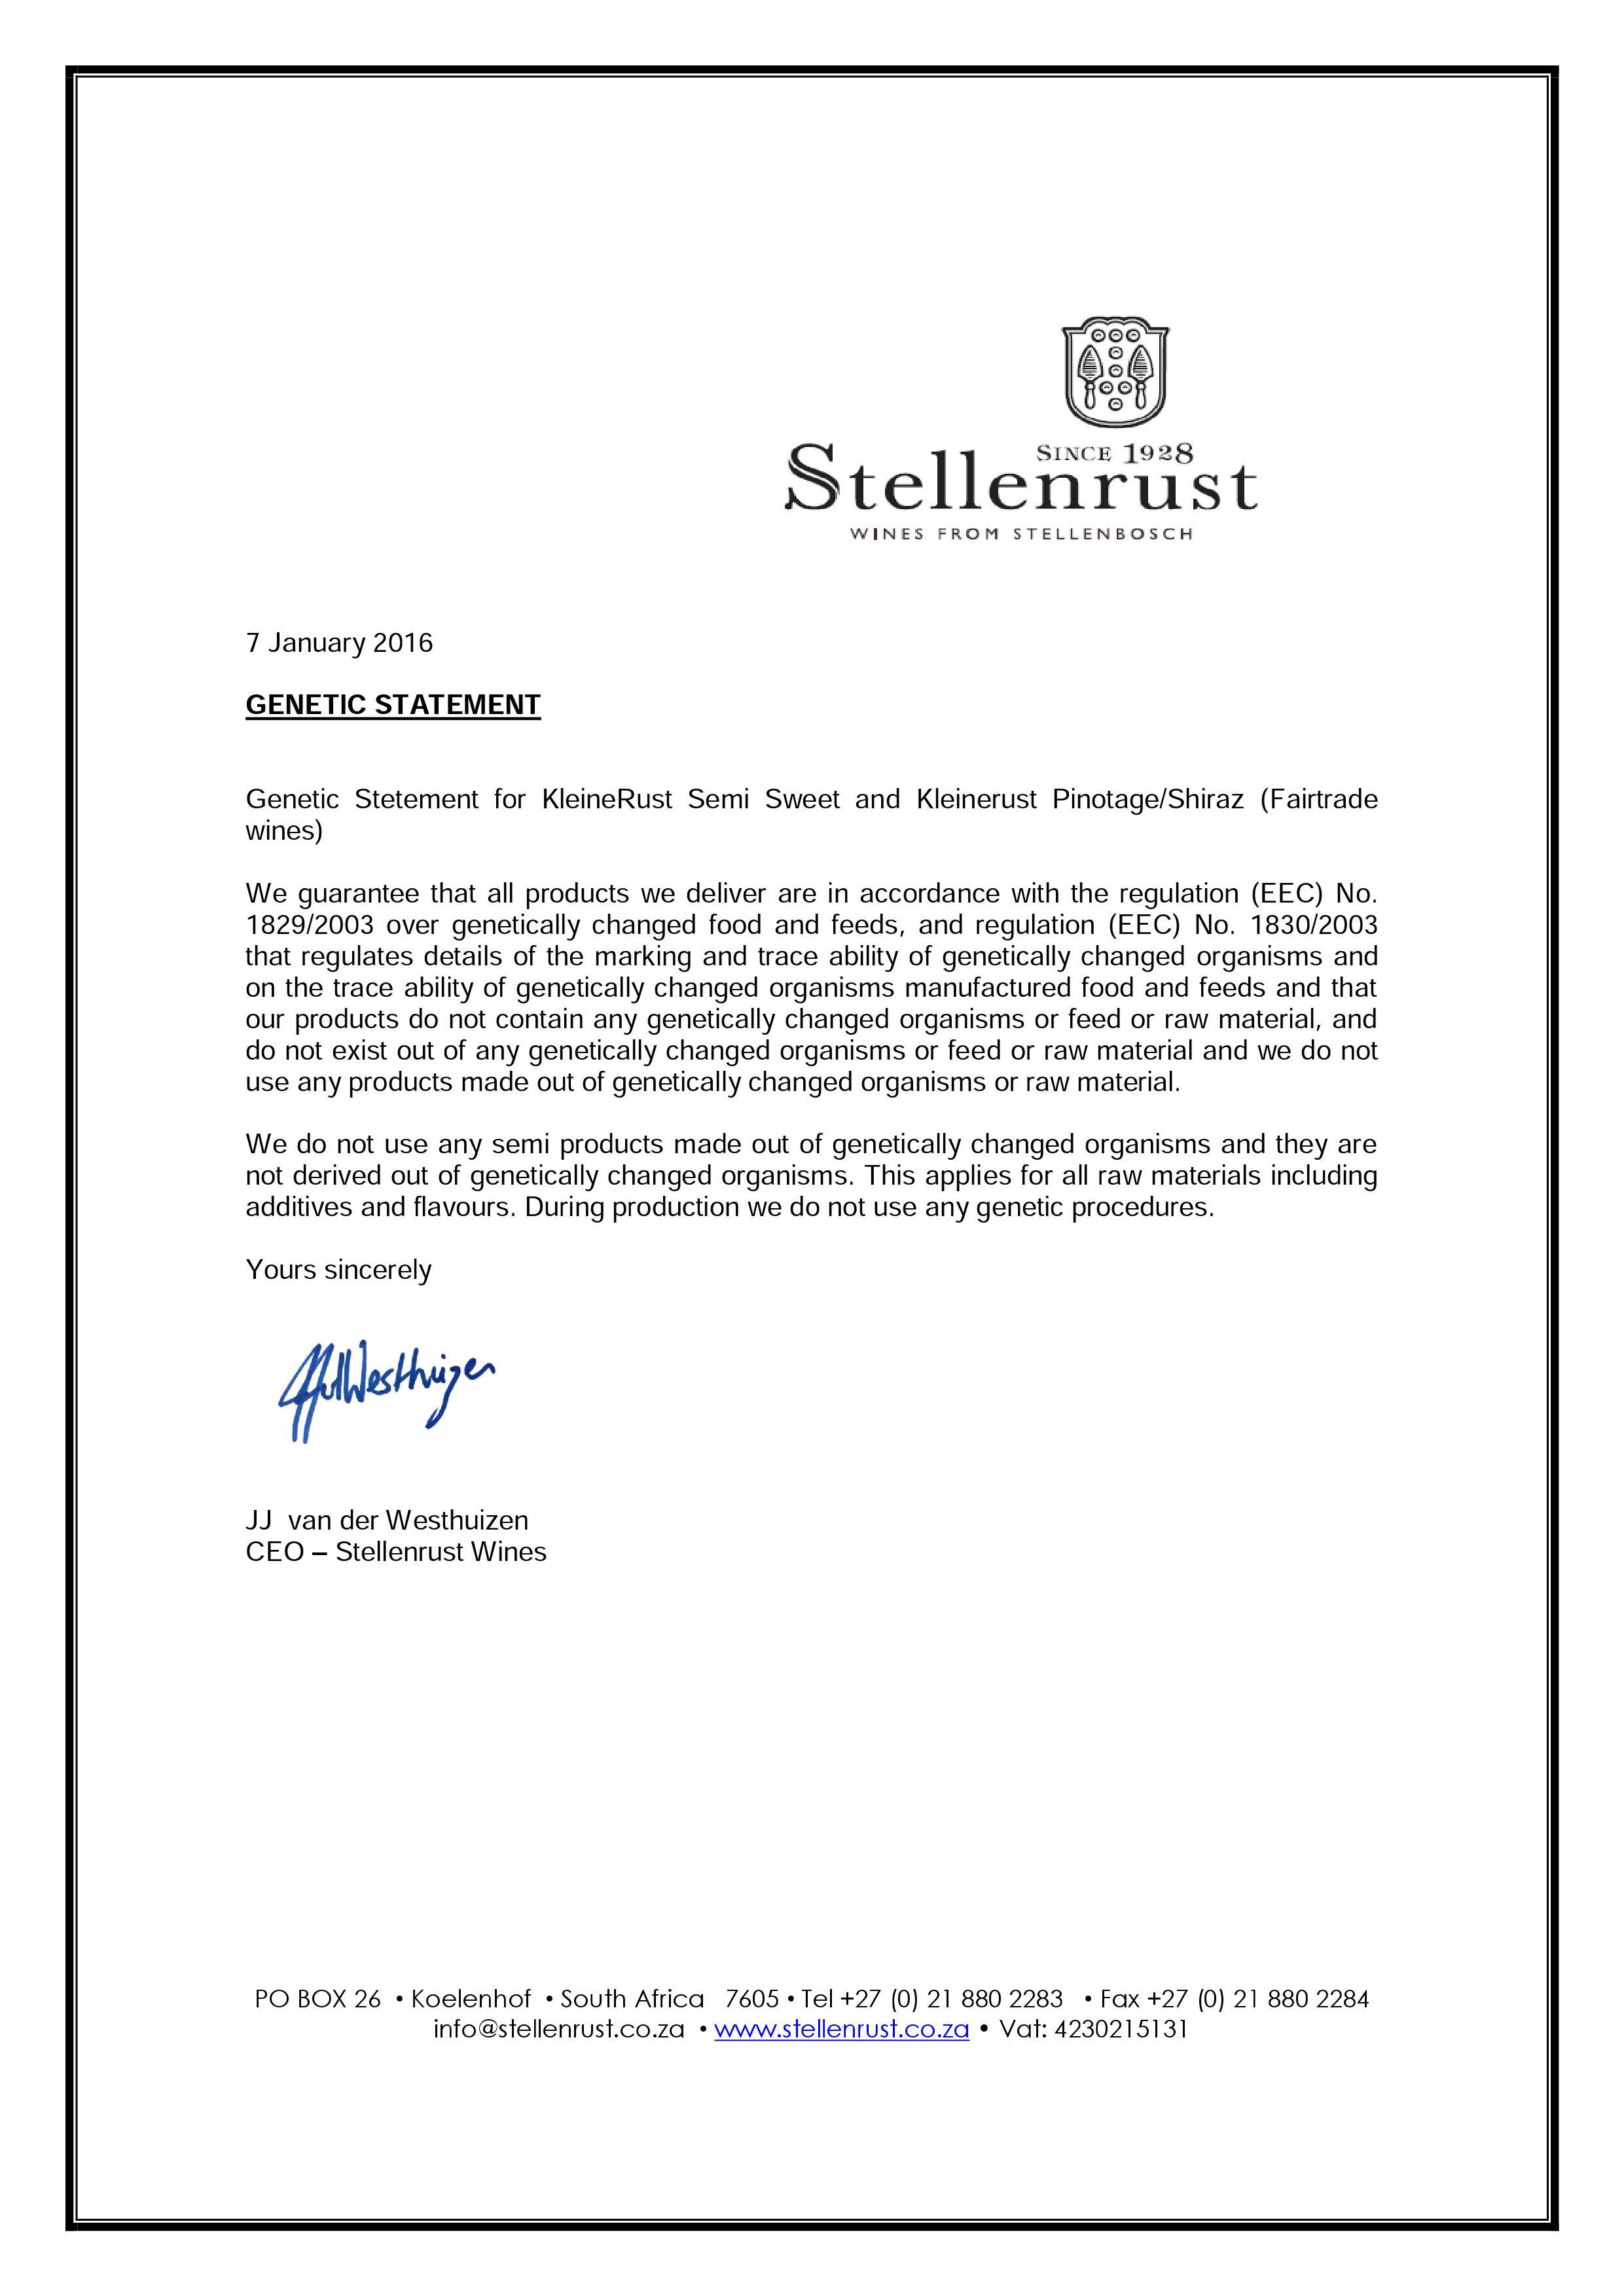 Stellenrust - Genetic Statement